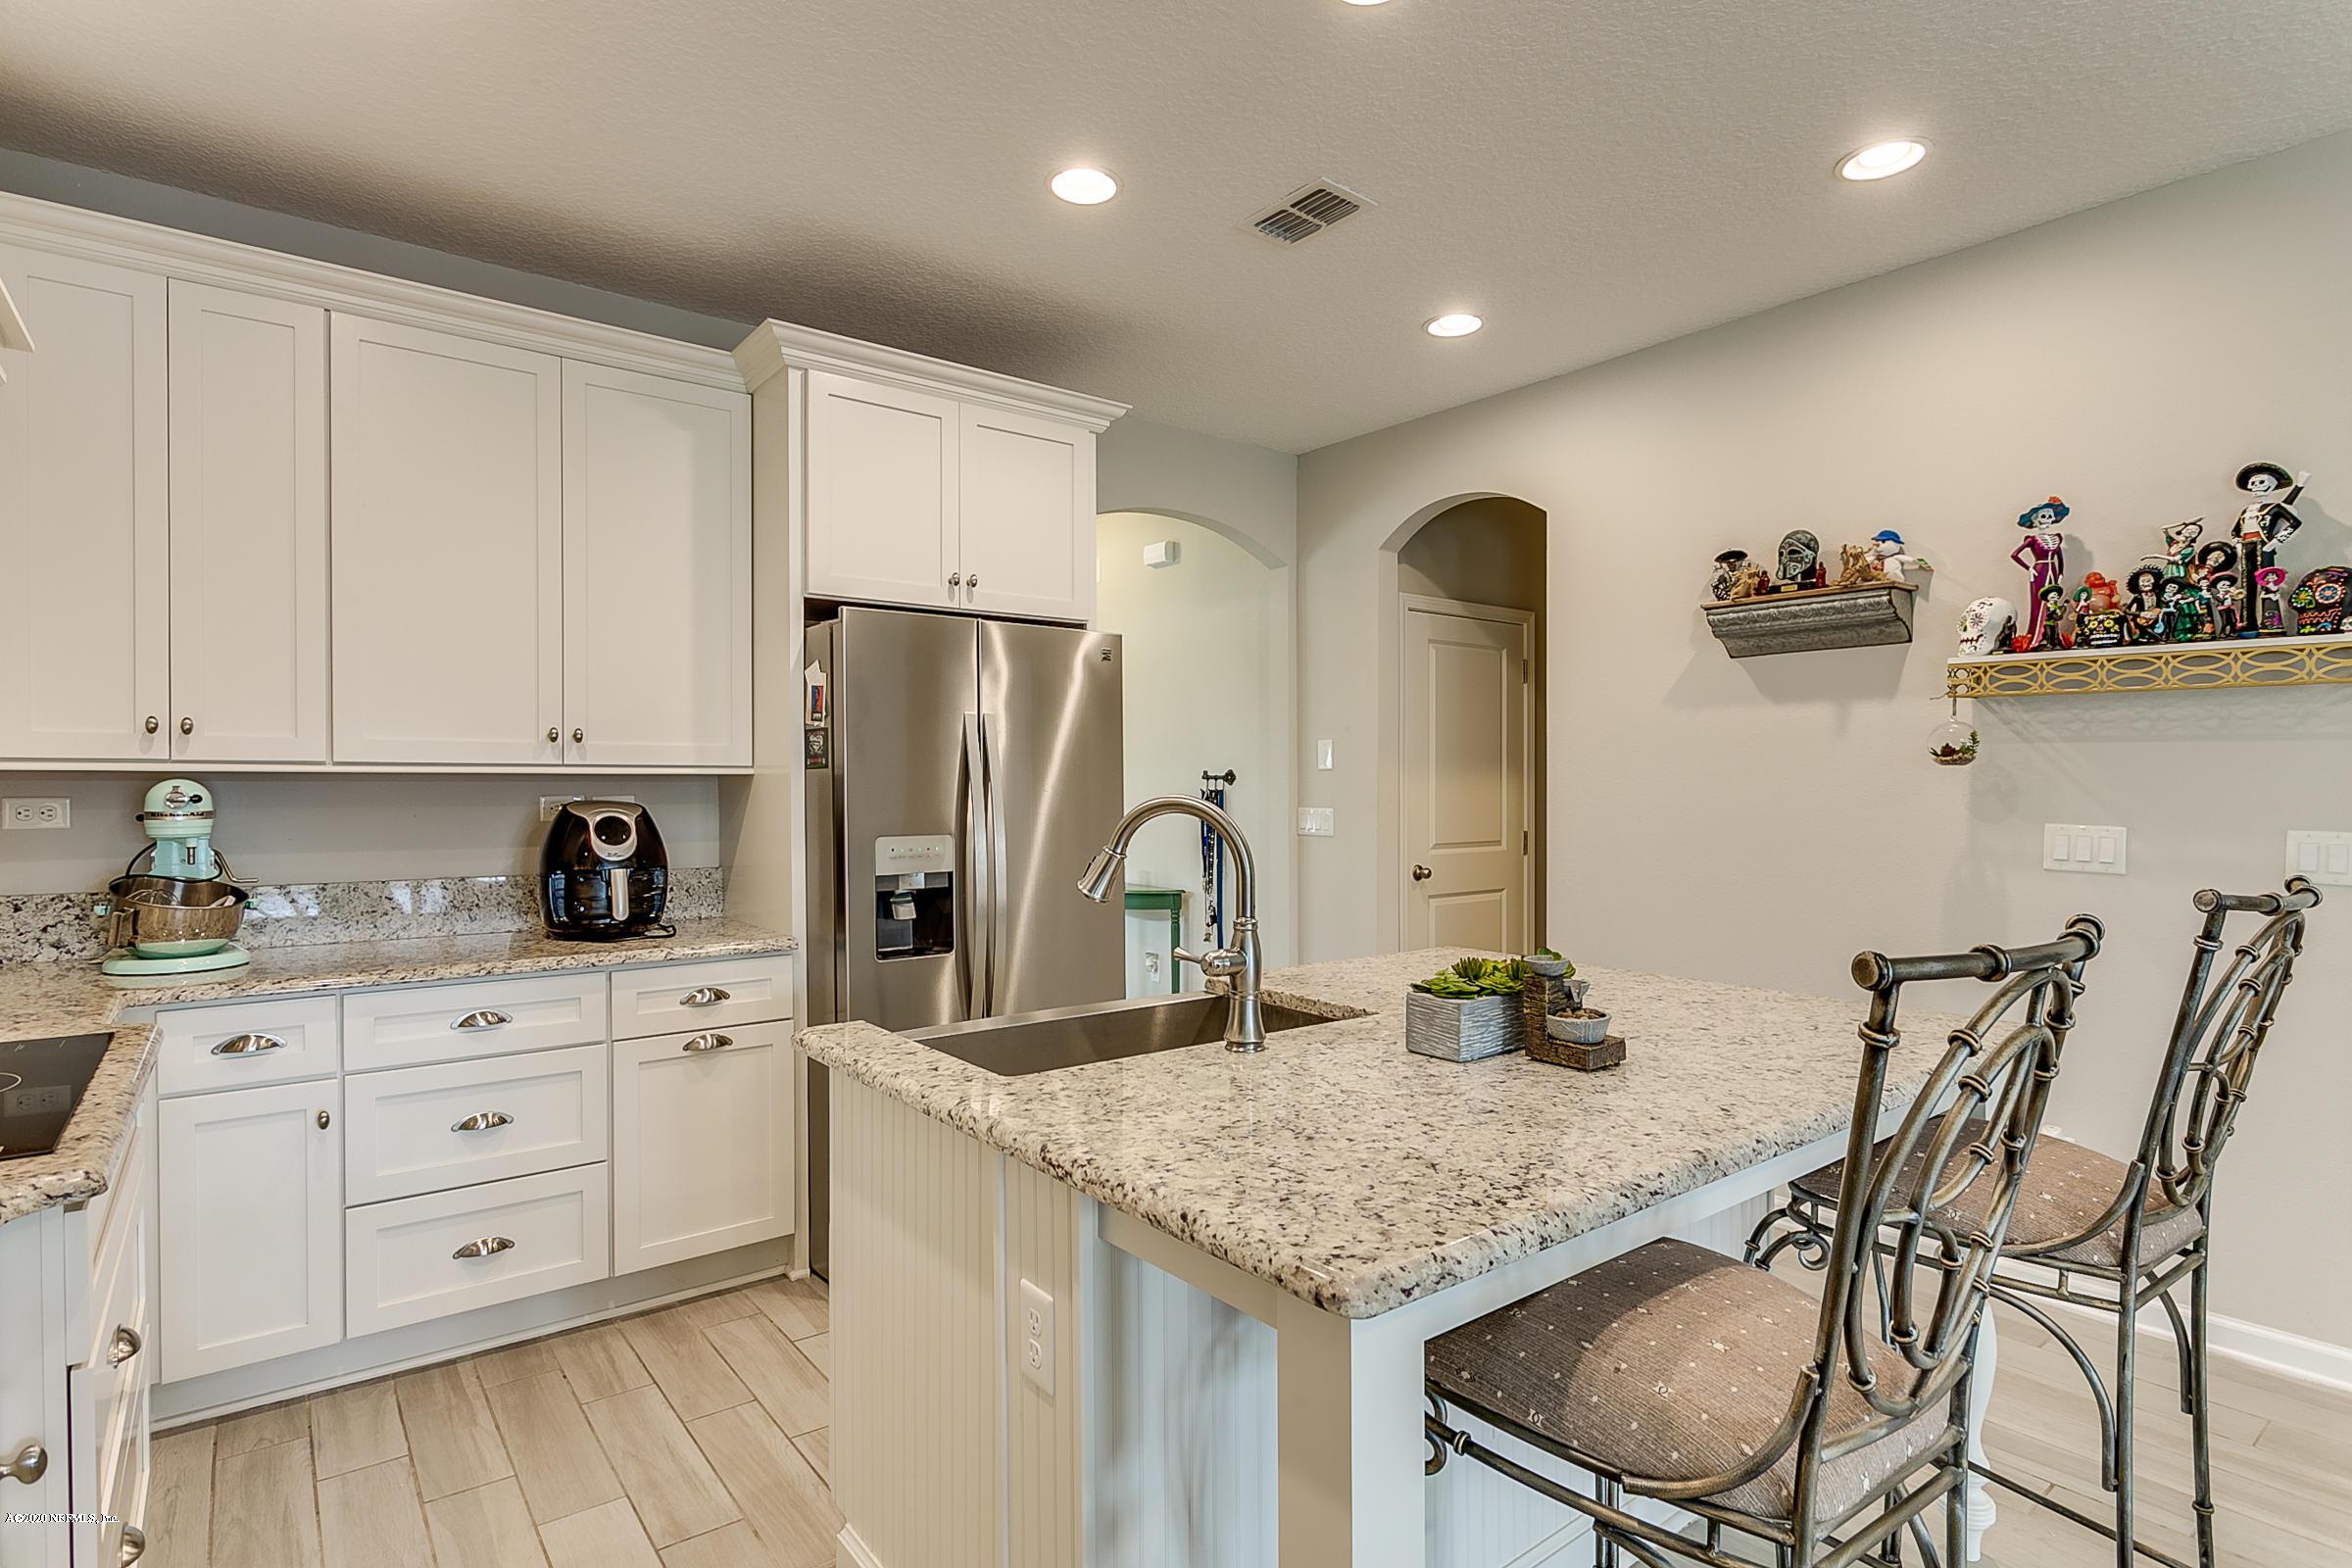 2313 EAGLE TALON, FLEMING ISLAND, FLORIDA 32003, 3 Bedrooms Bedrooms, ,2 BathroomsBathrooms,Residential,For sale,EAGLE TALON,1042054